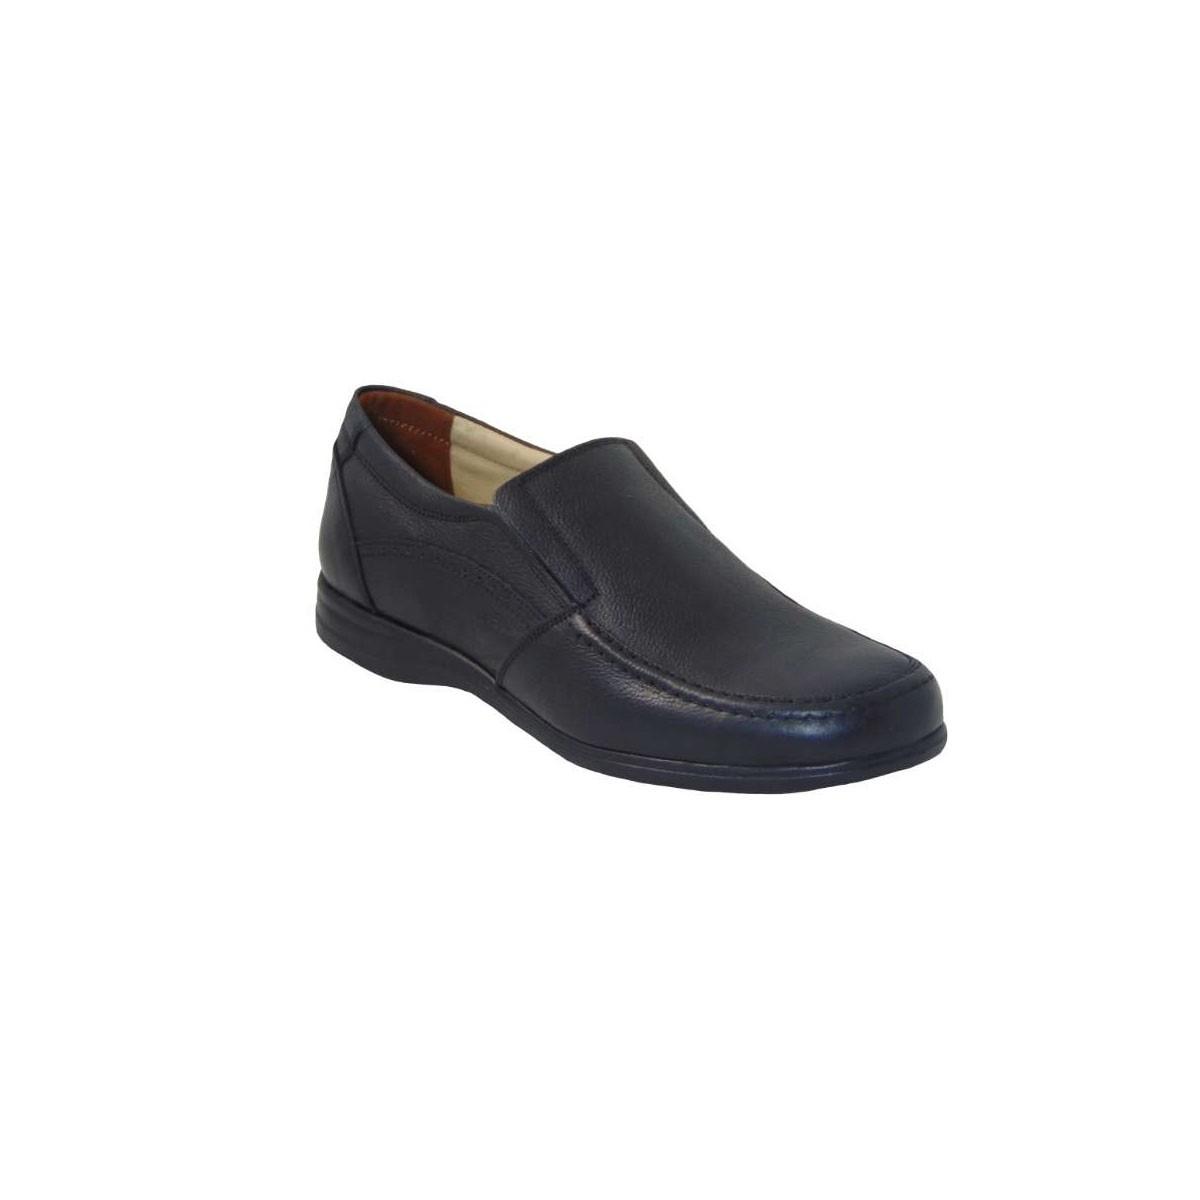 Tsimpolis Shoes 430 Ανδρικό Slip On Δερμάτινο Μαύρο